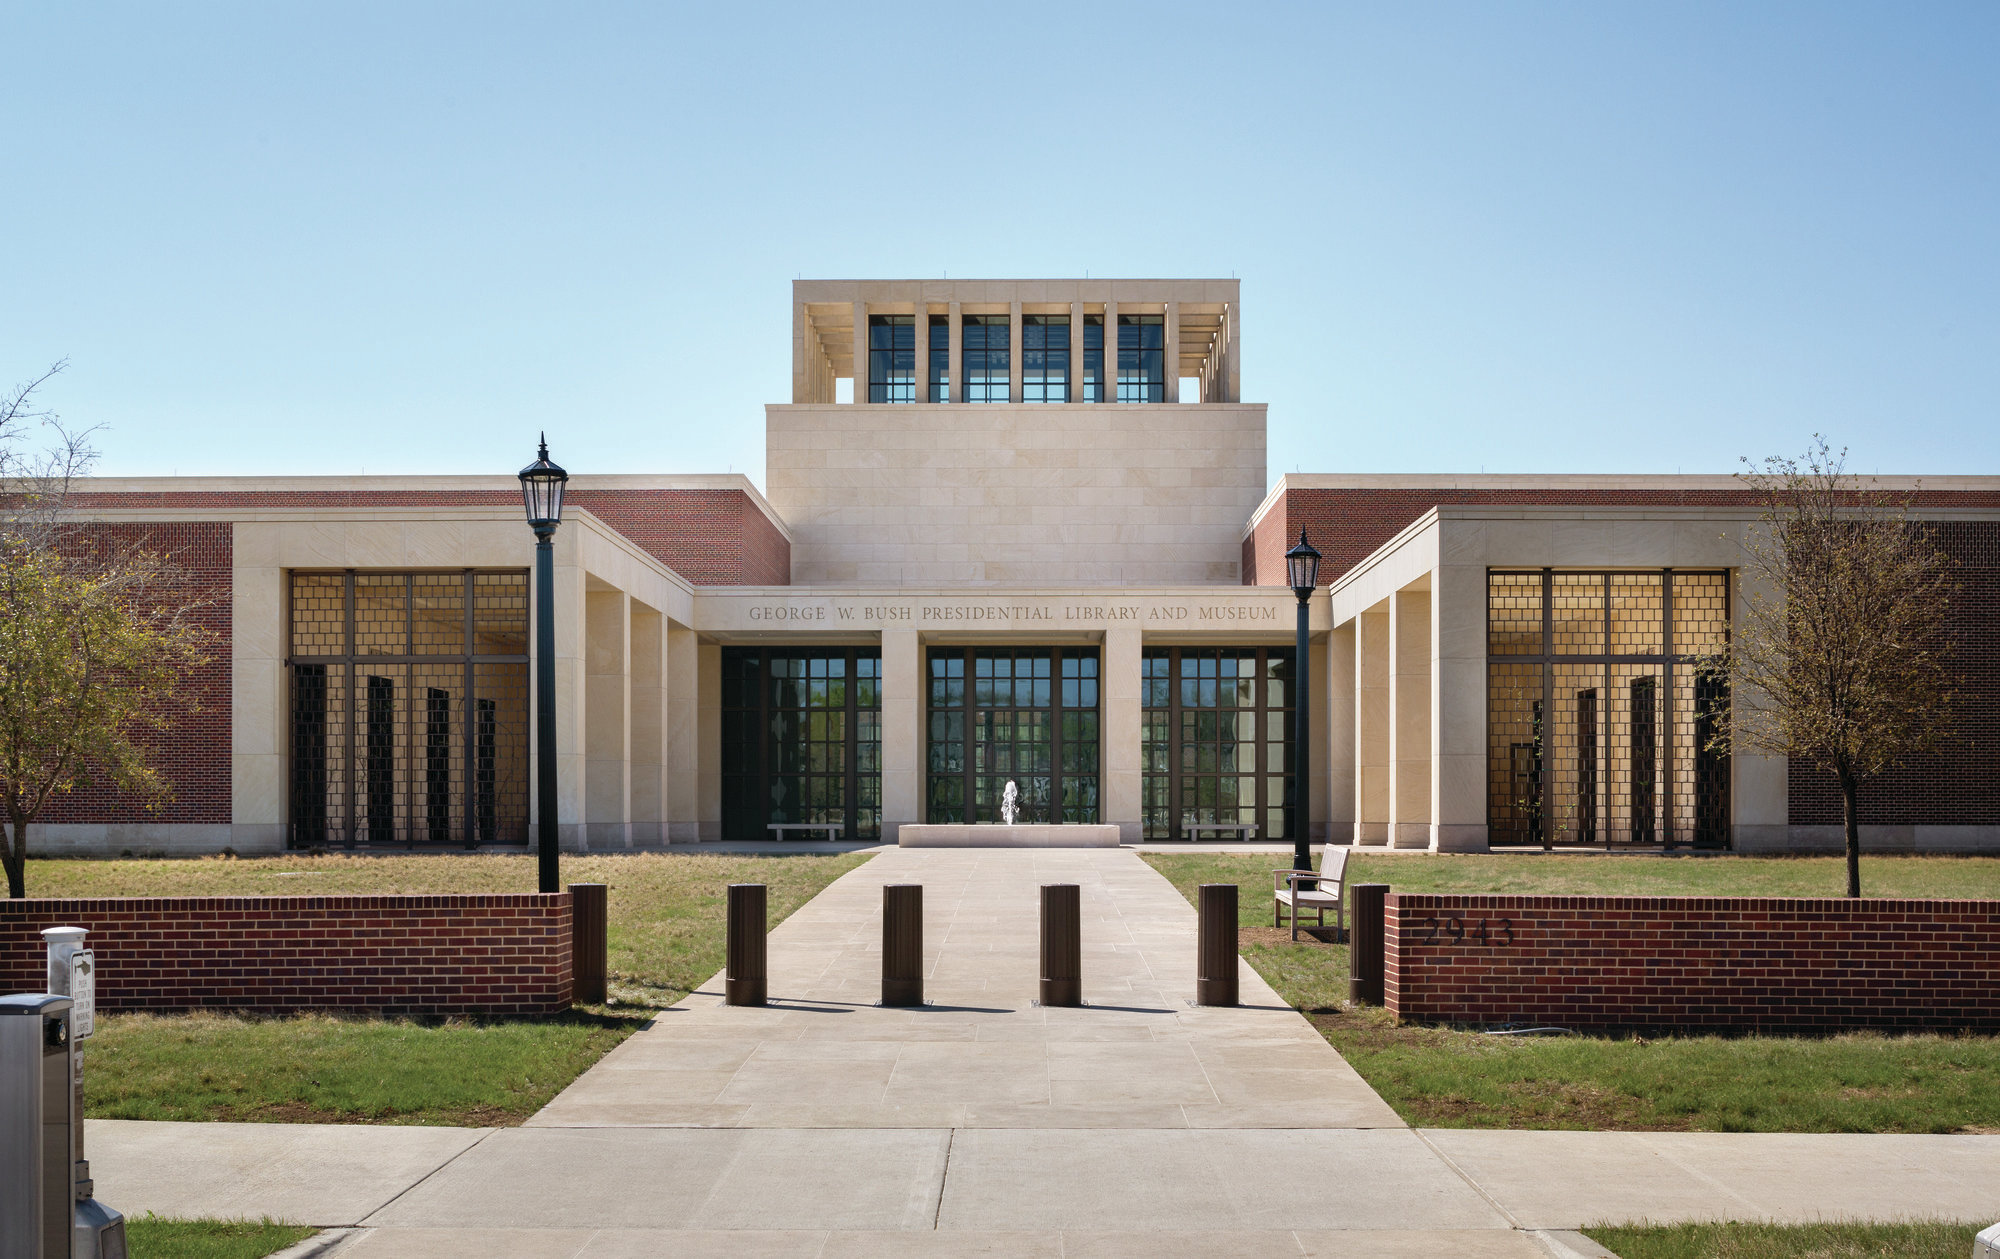 George w bush presidential center architect magazine - Interior design firms fort worth tx ...